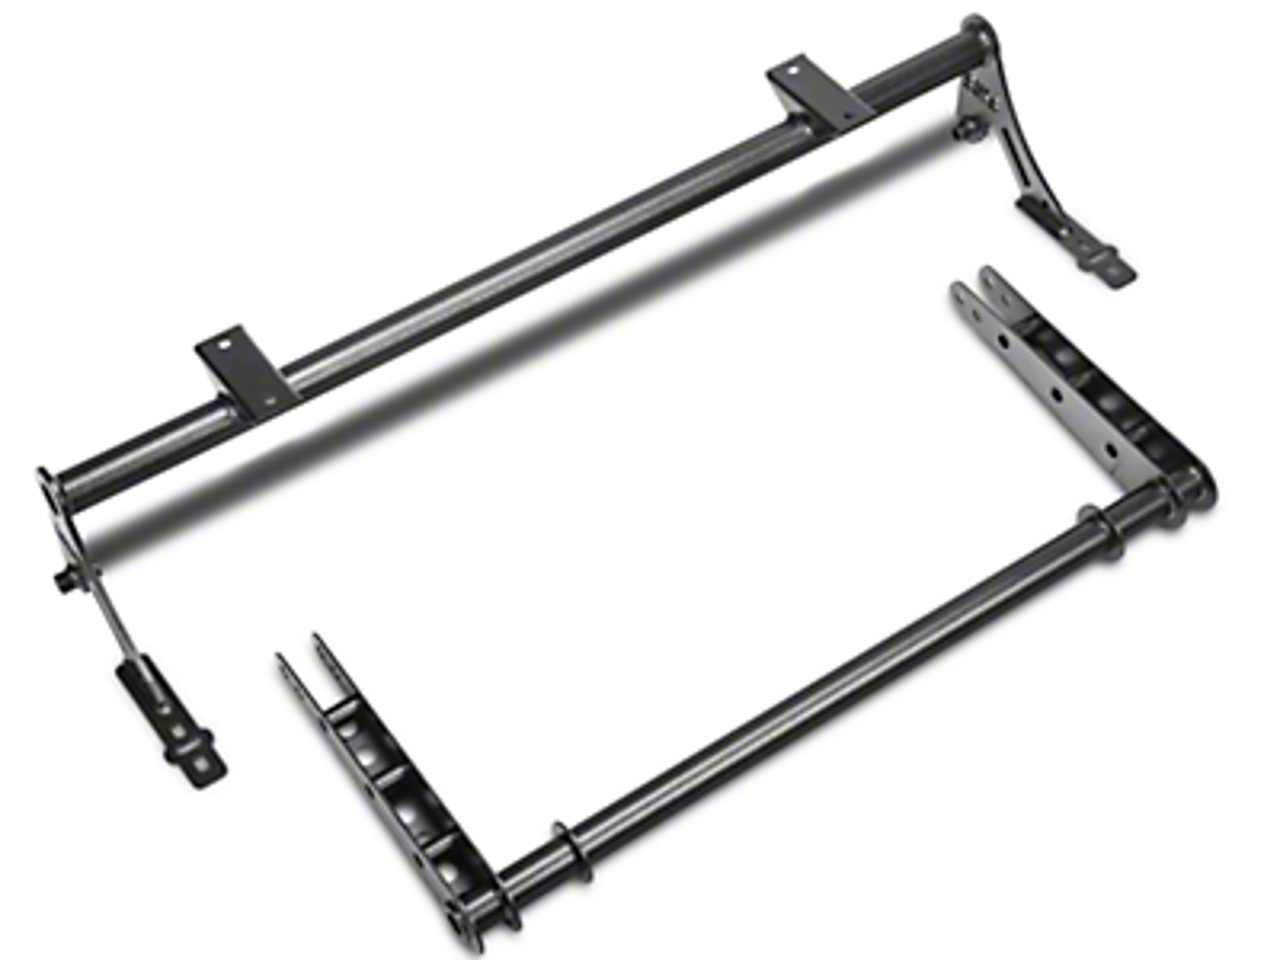 BMR Xtreme Rear Sway Bar Kit - Hammertone (05-14 All)